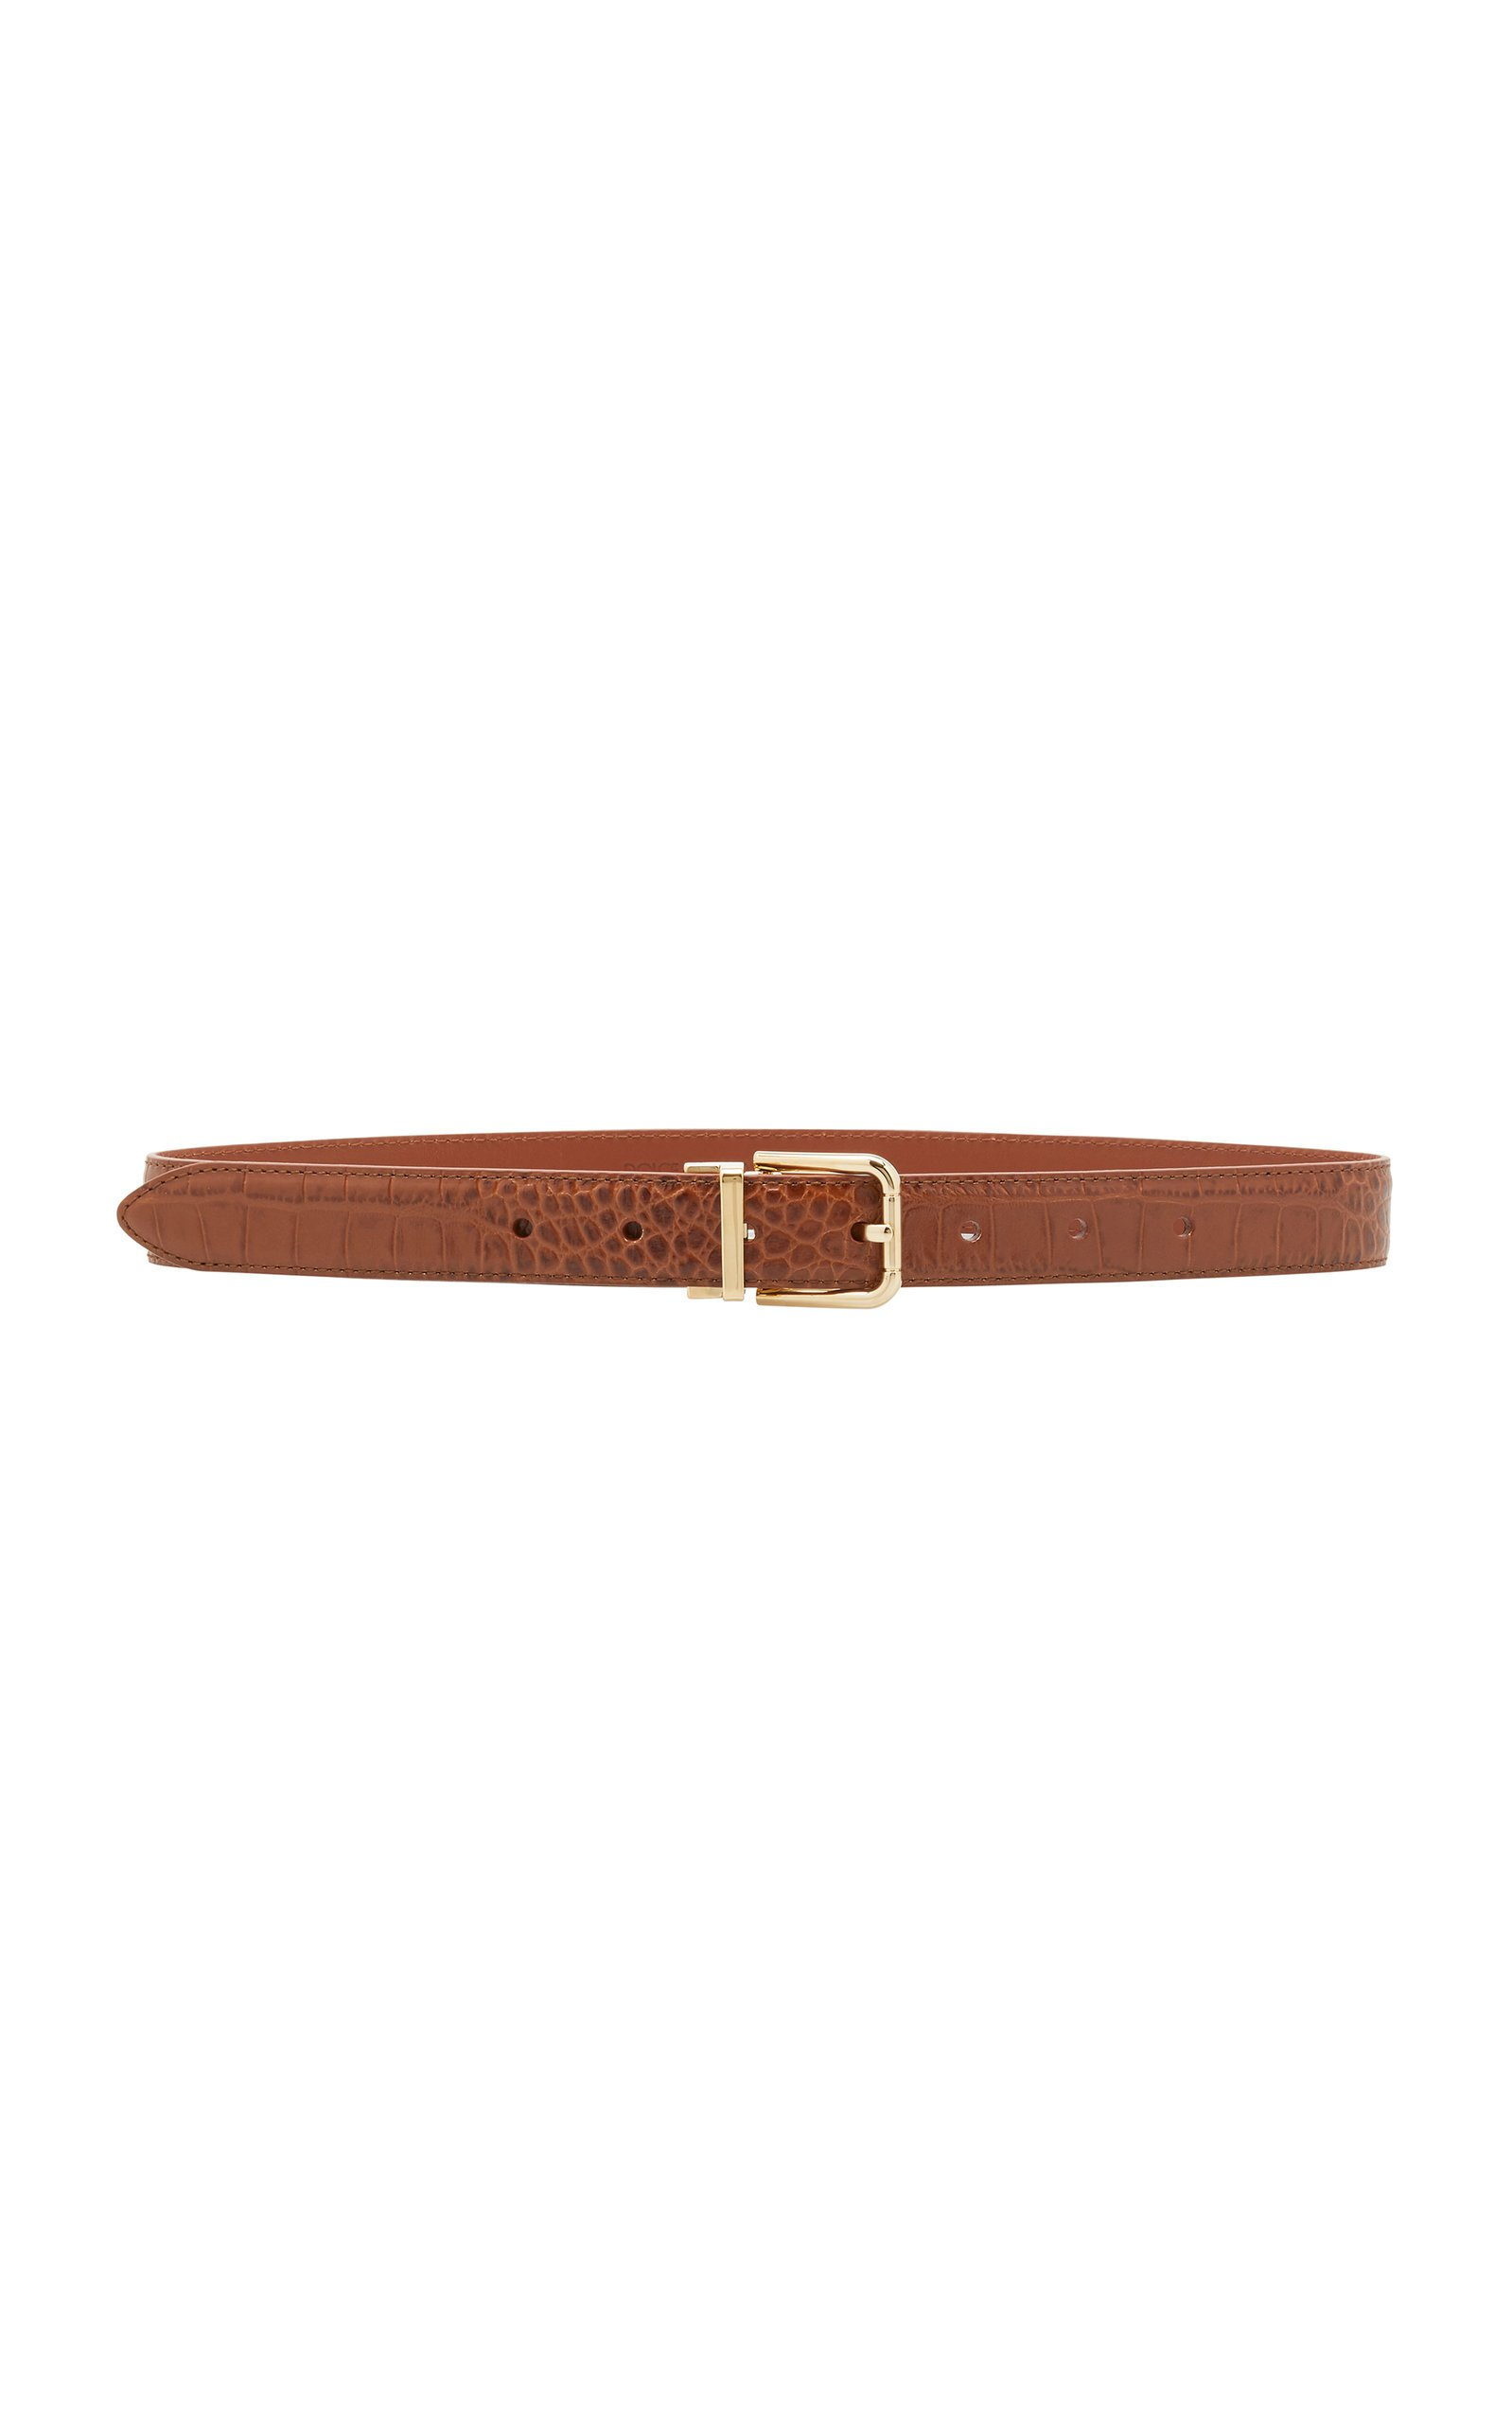 Dolce & Gabbana Croc-Effect Leather Belt Size: 80 cm